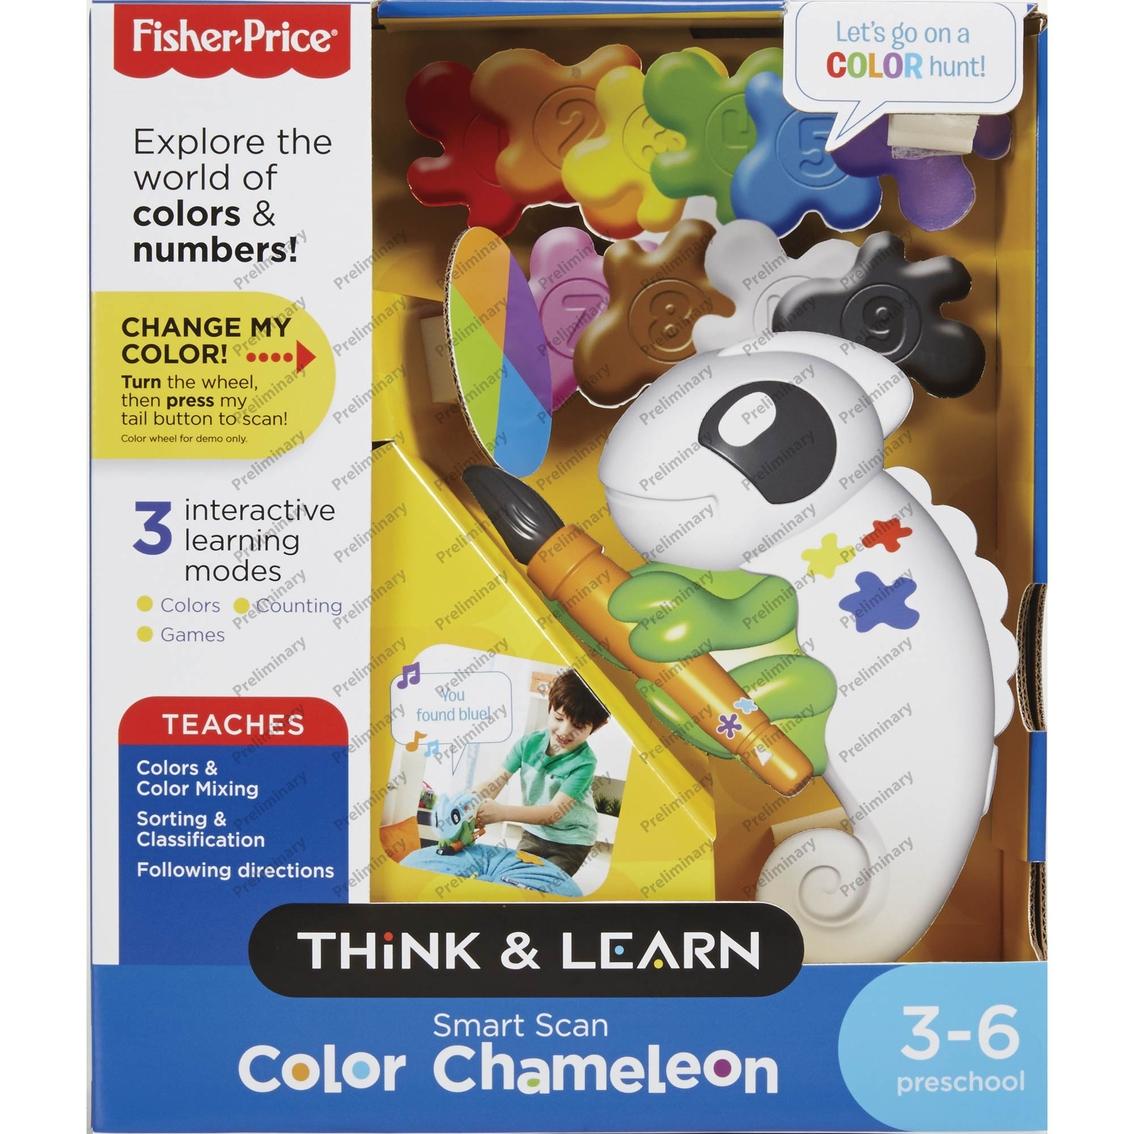 Fisher price smart scan color chameleon fine motor skills baby 2201 buycottarizona